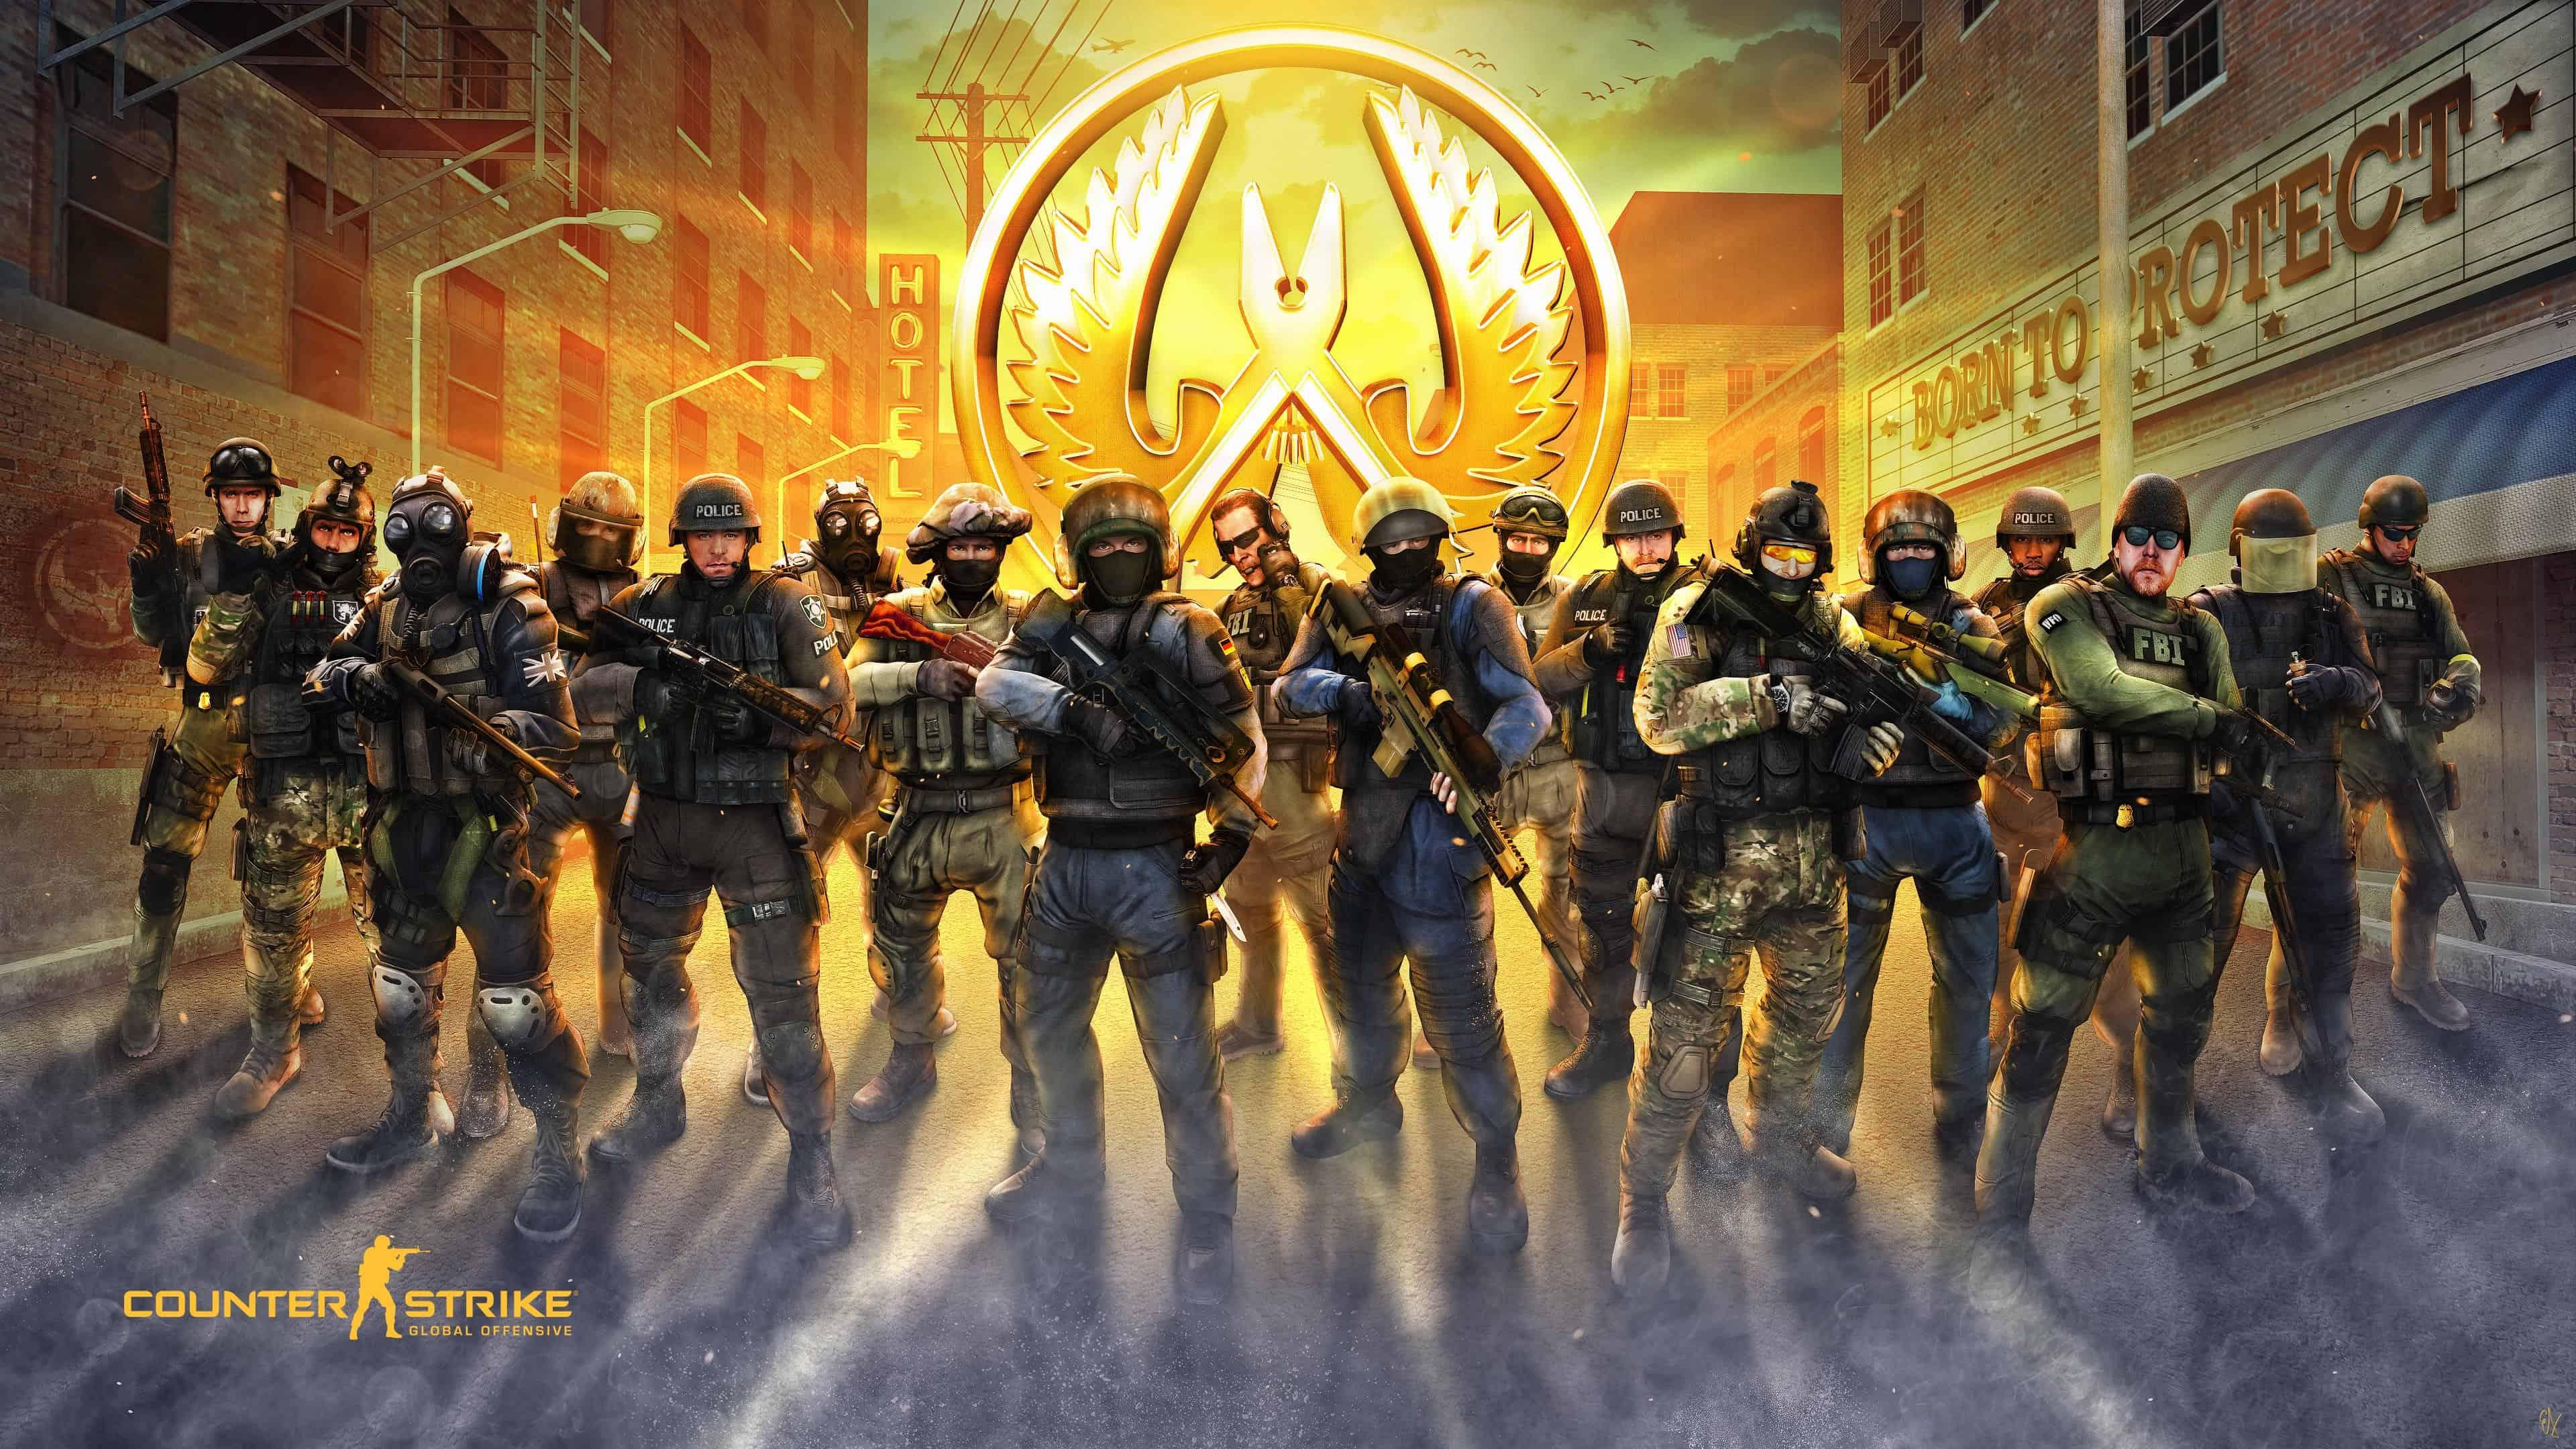 Download Wallpapers Cars Hd Counter Strike Global Offensive Cs Go Artwork Uhd 4k